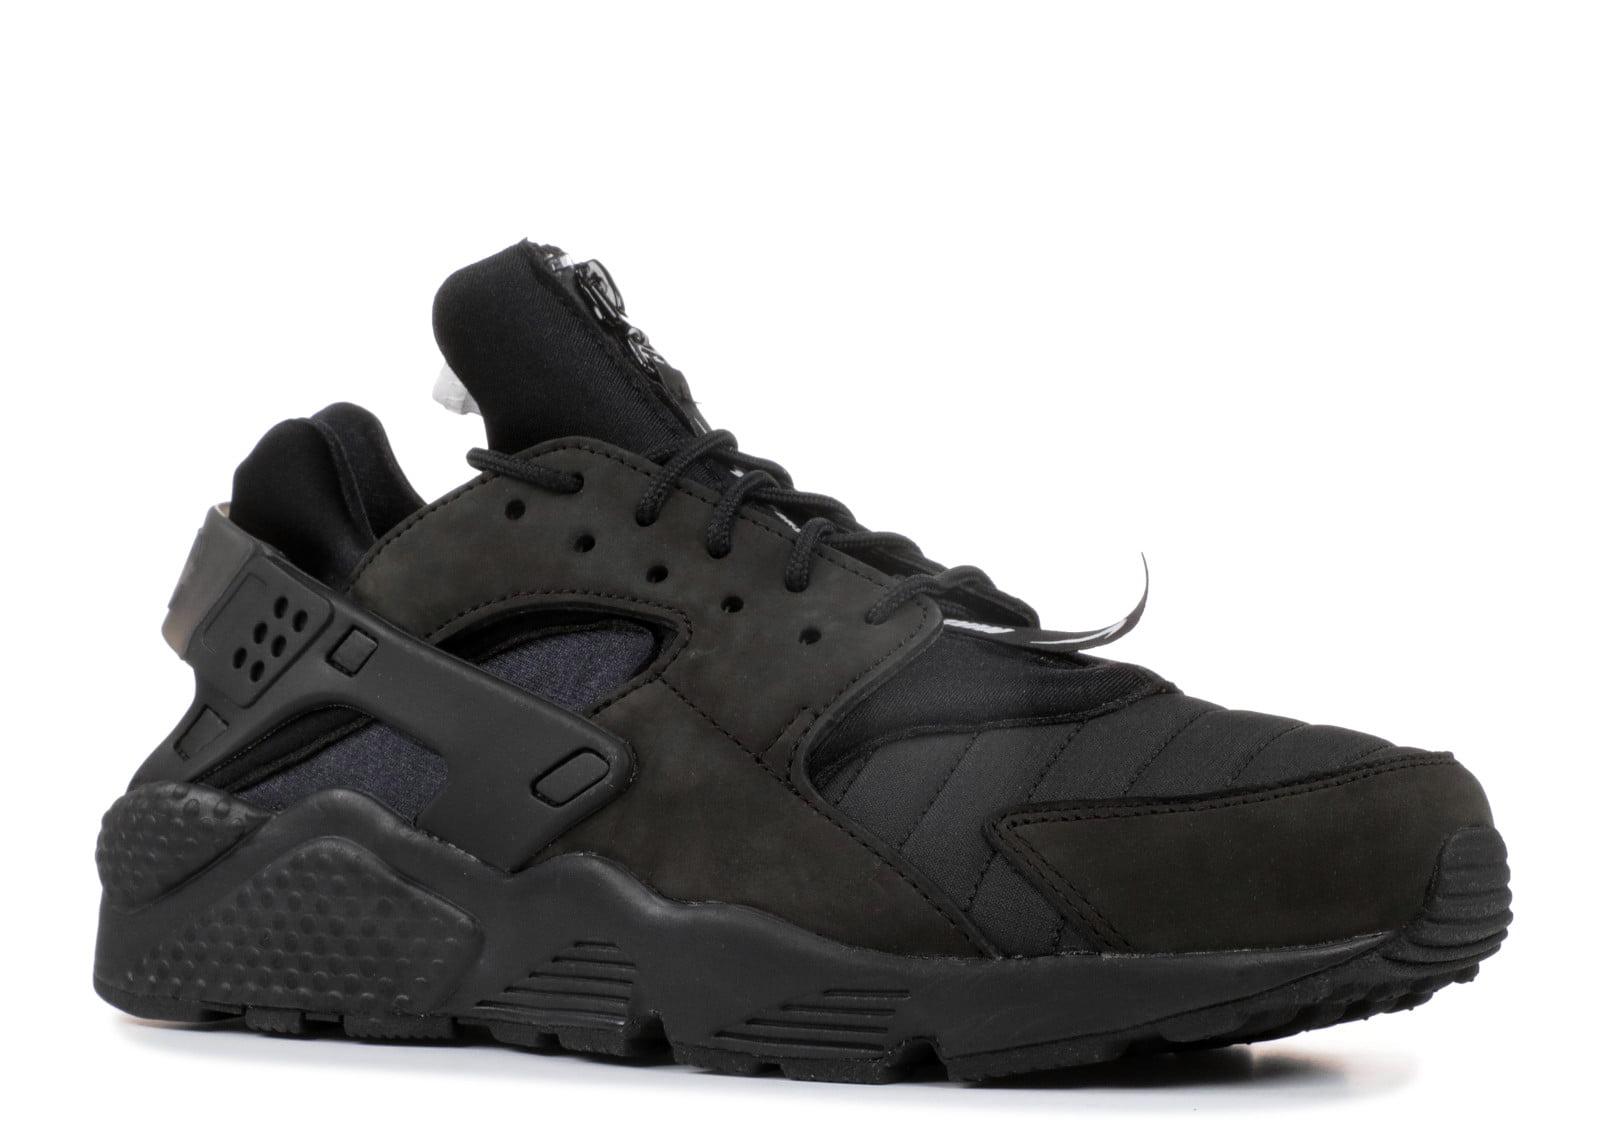 camminare Spettacolo esperto  Nike - Men - Nike Air Huarache Run Qs 'Nyc' - Aj5578-001 - Size 9.5 |  Walmart Canada